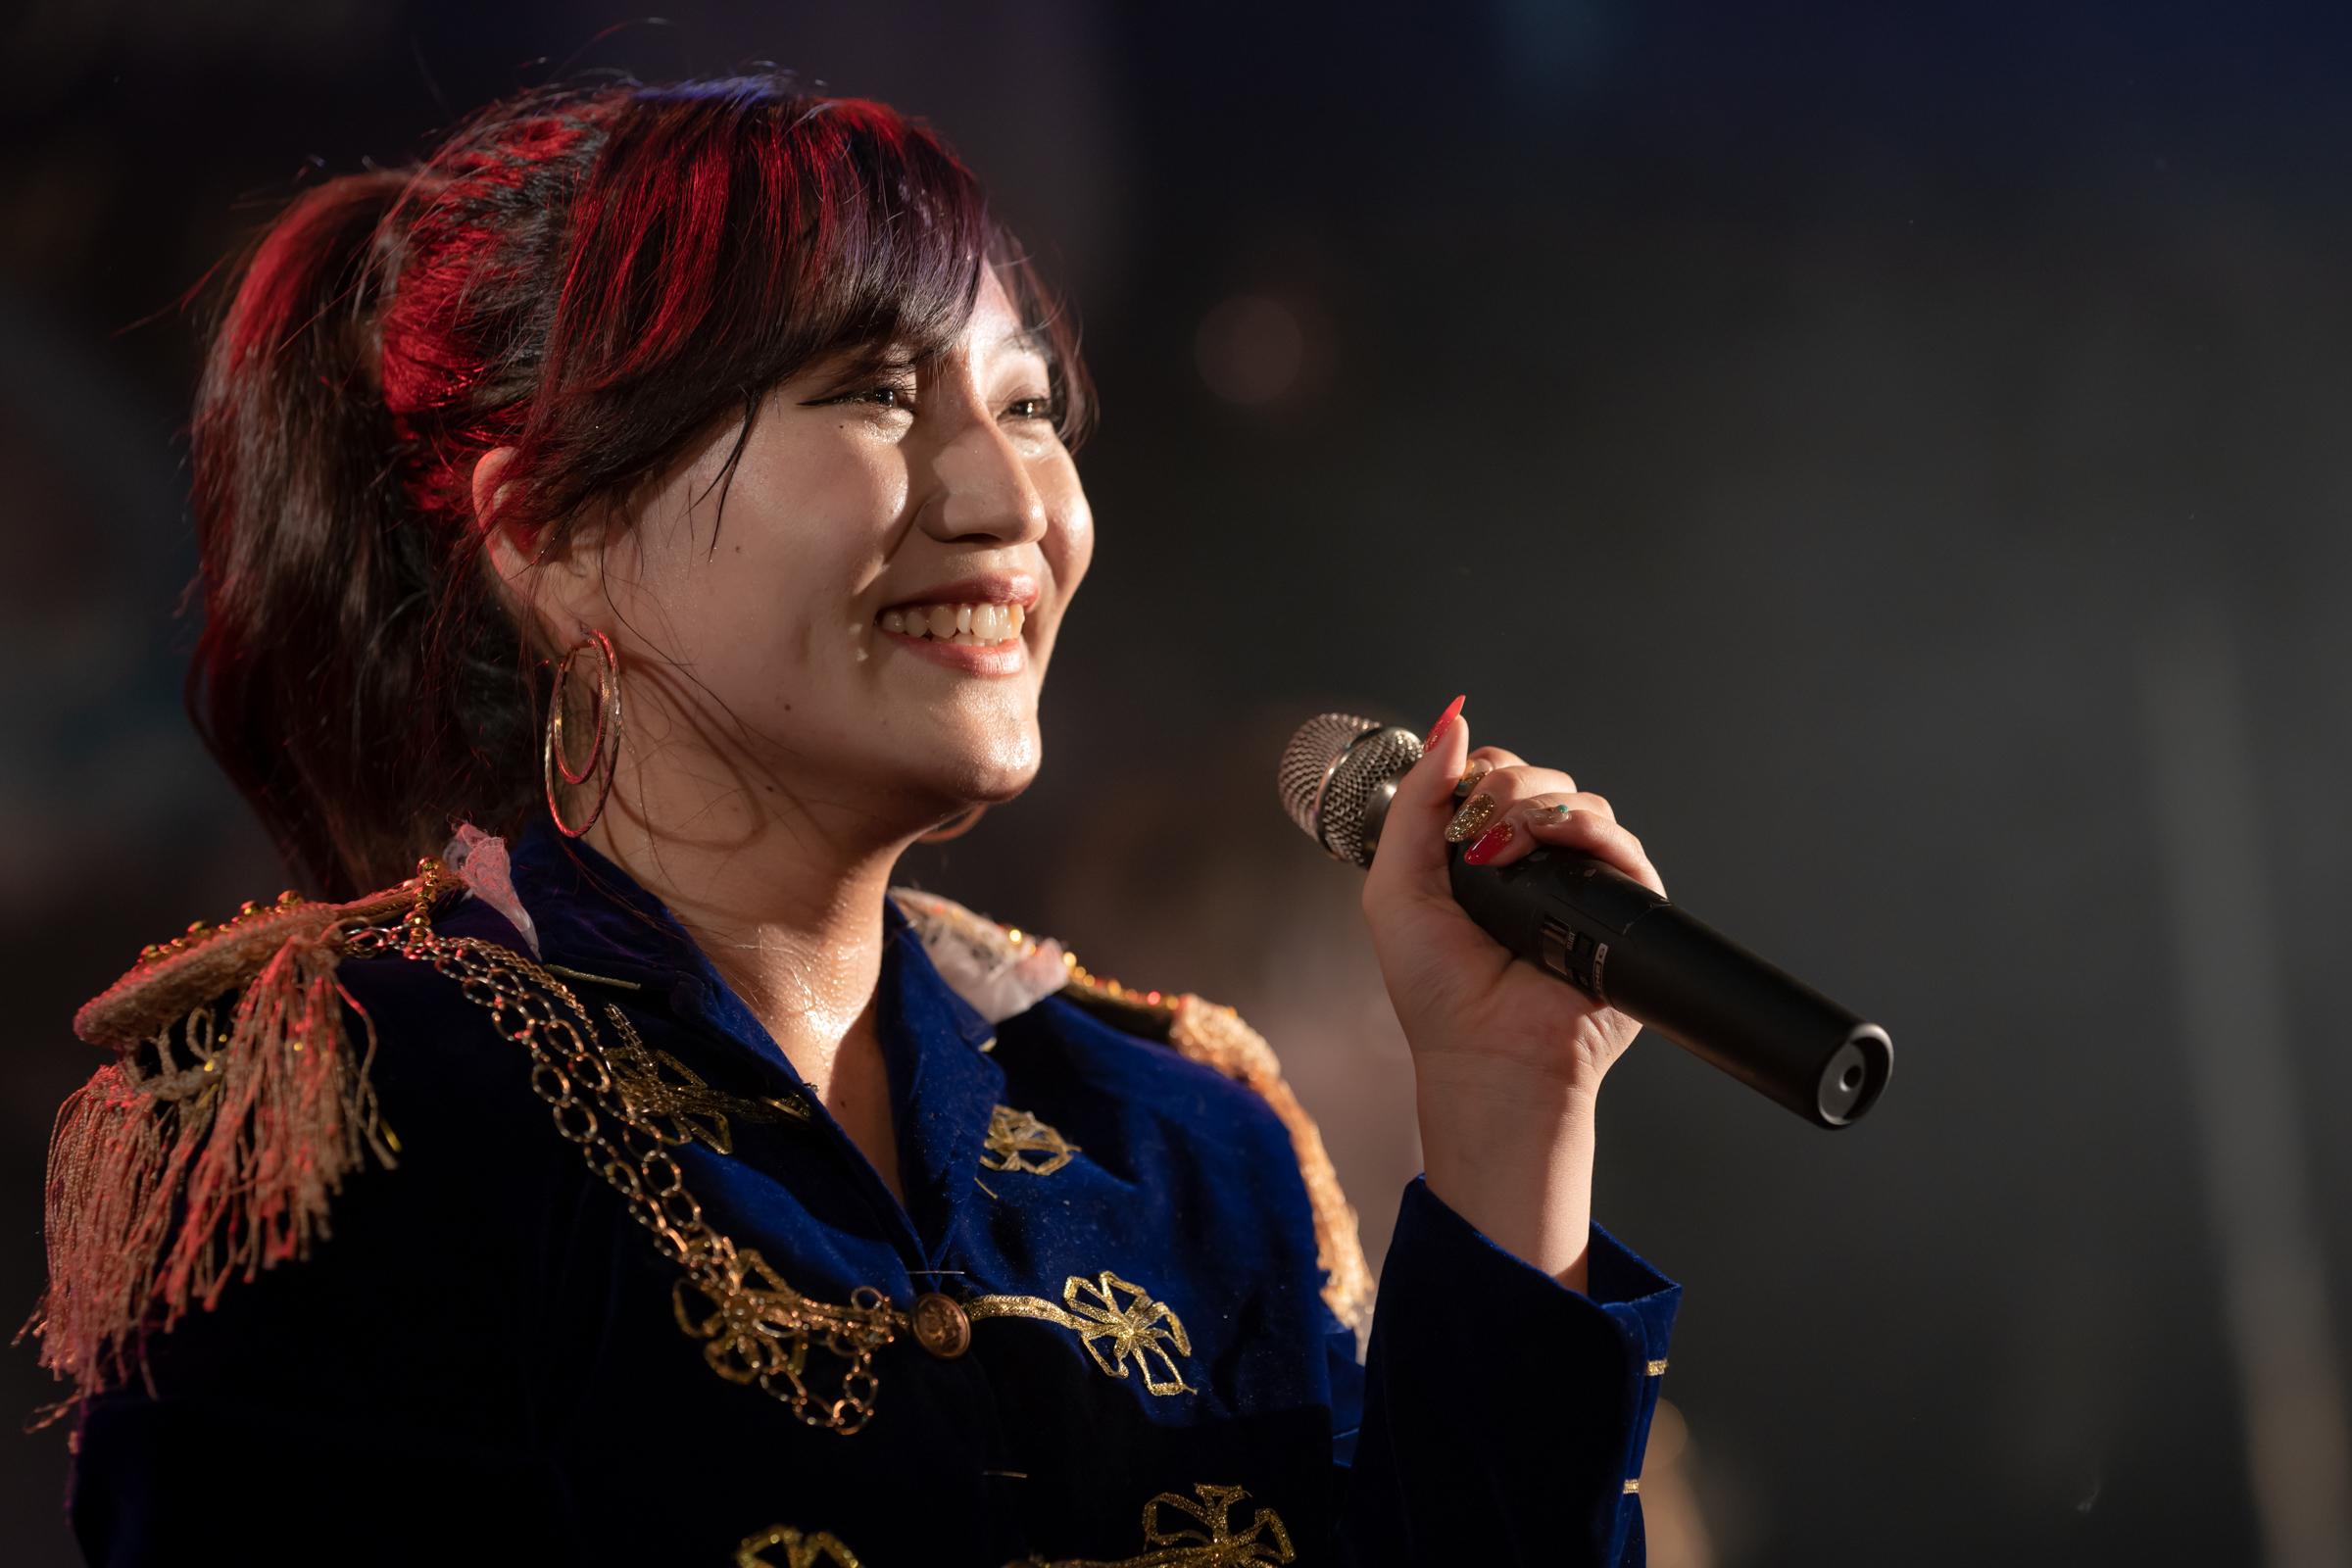 G.E.E.K TEI | フルーティー定期公演フルーツバスケット~おまる生誕~